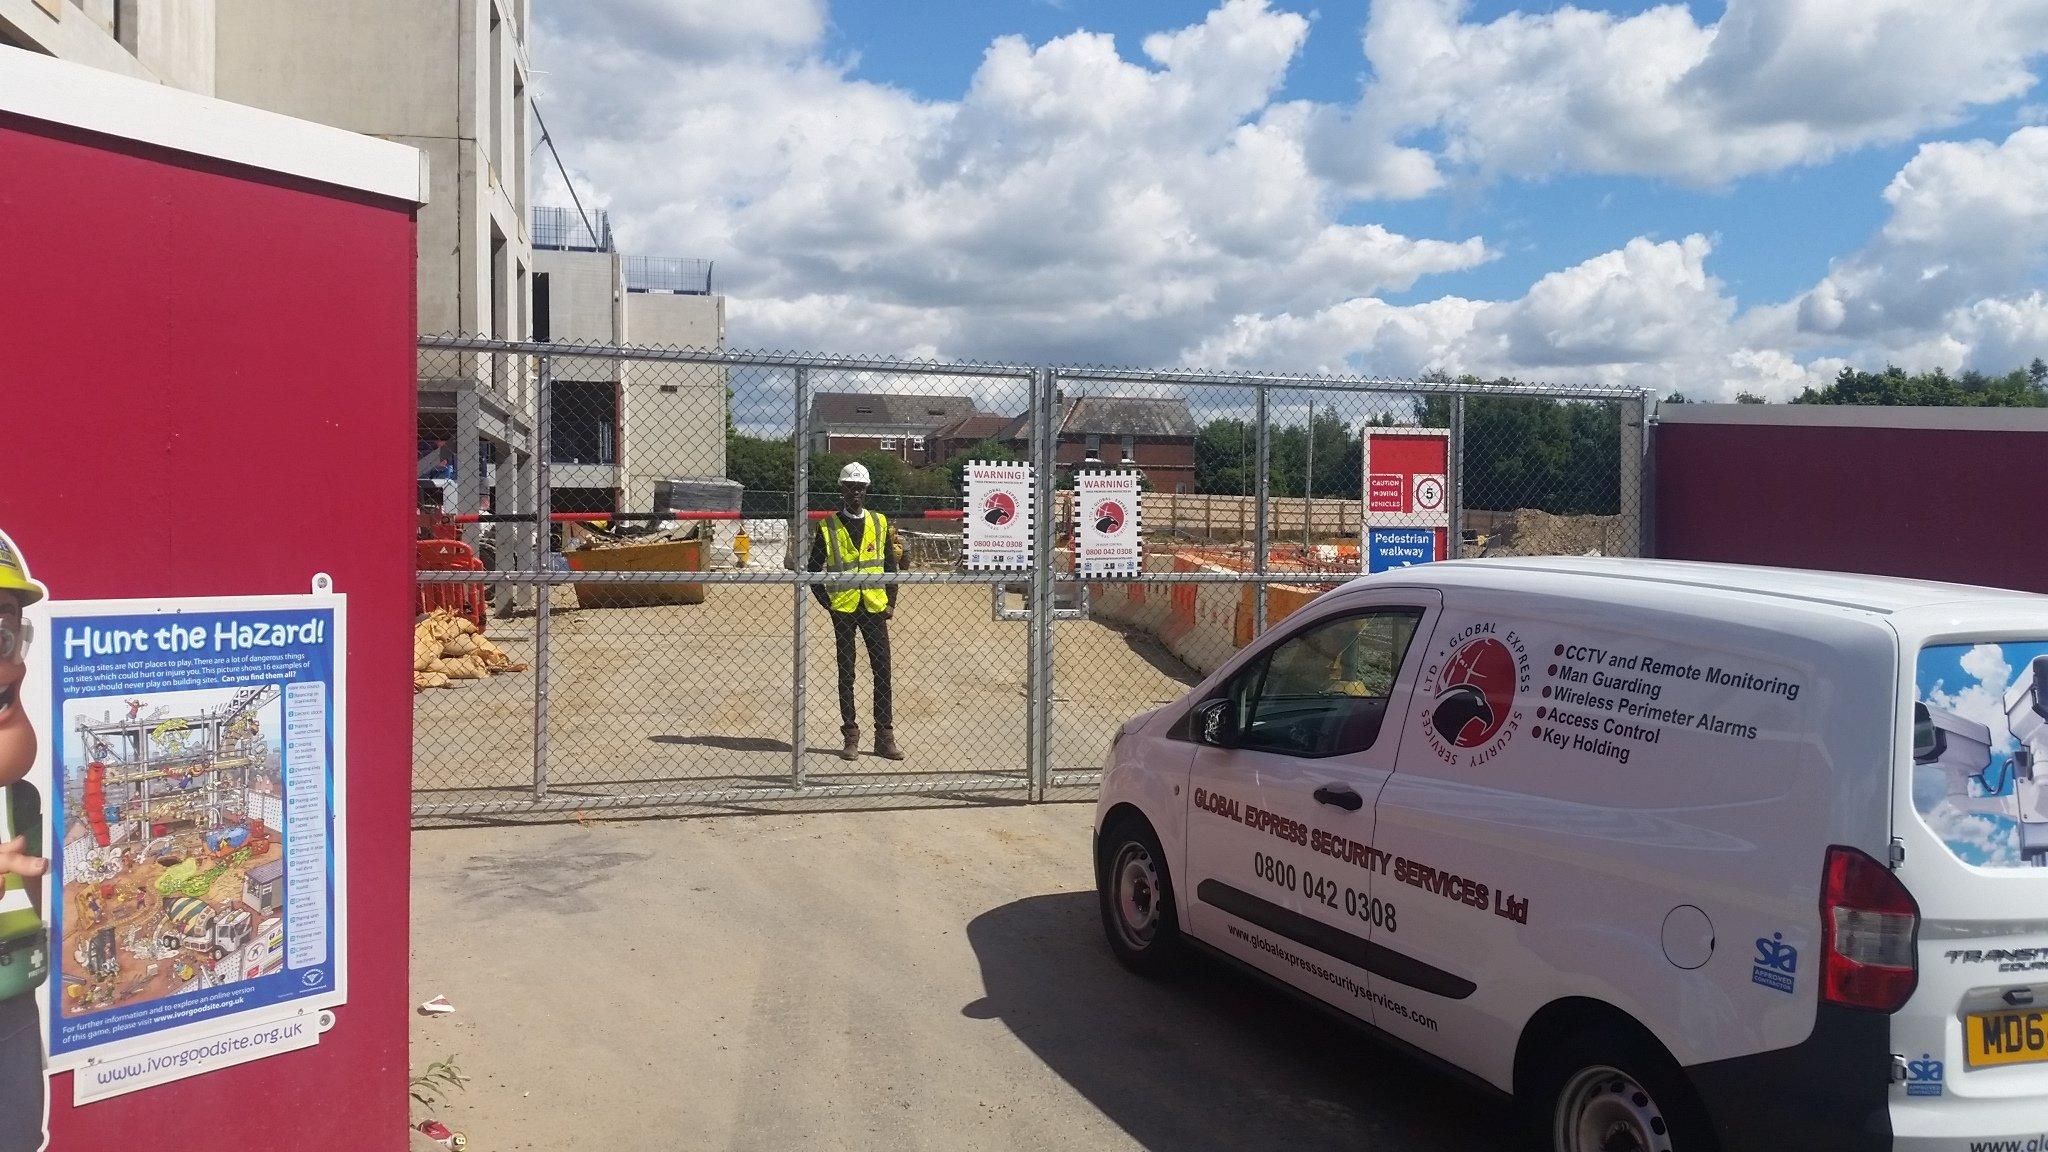 Construction site security personnel